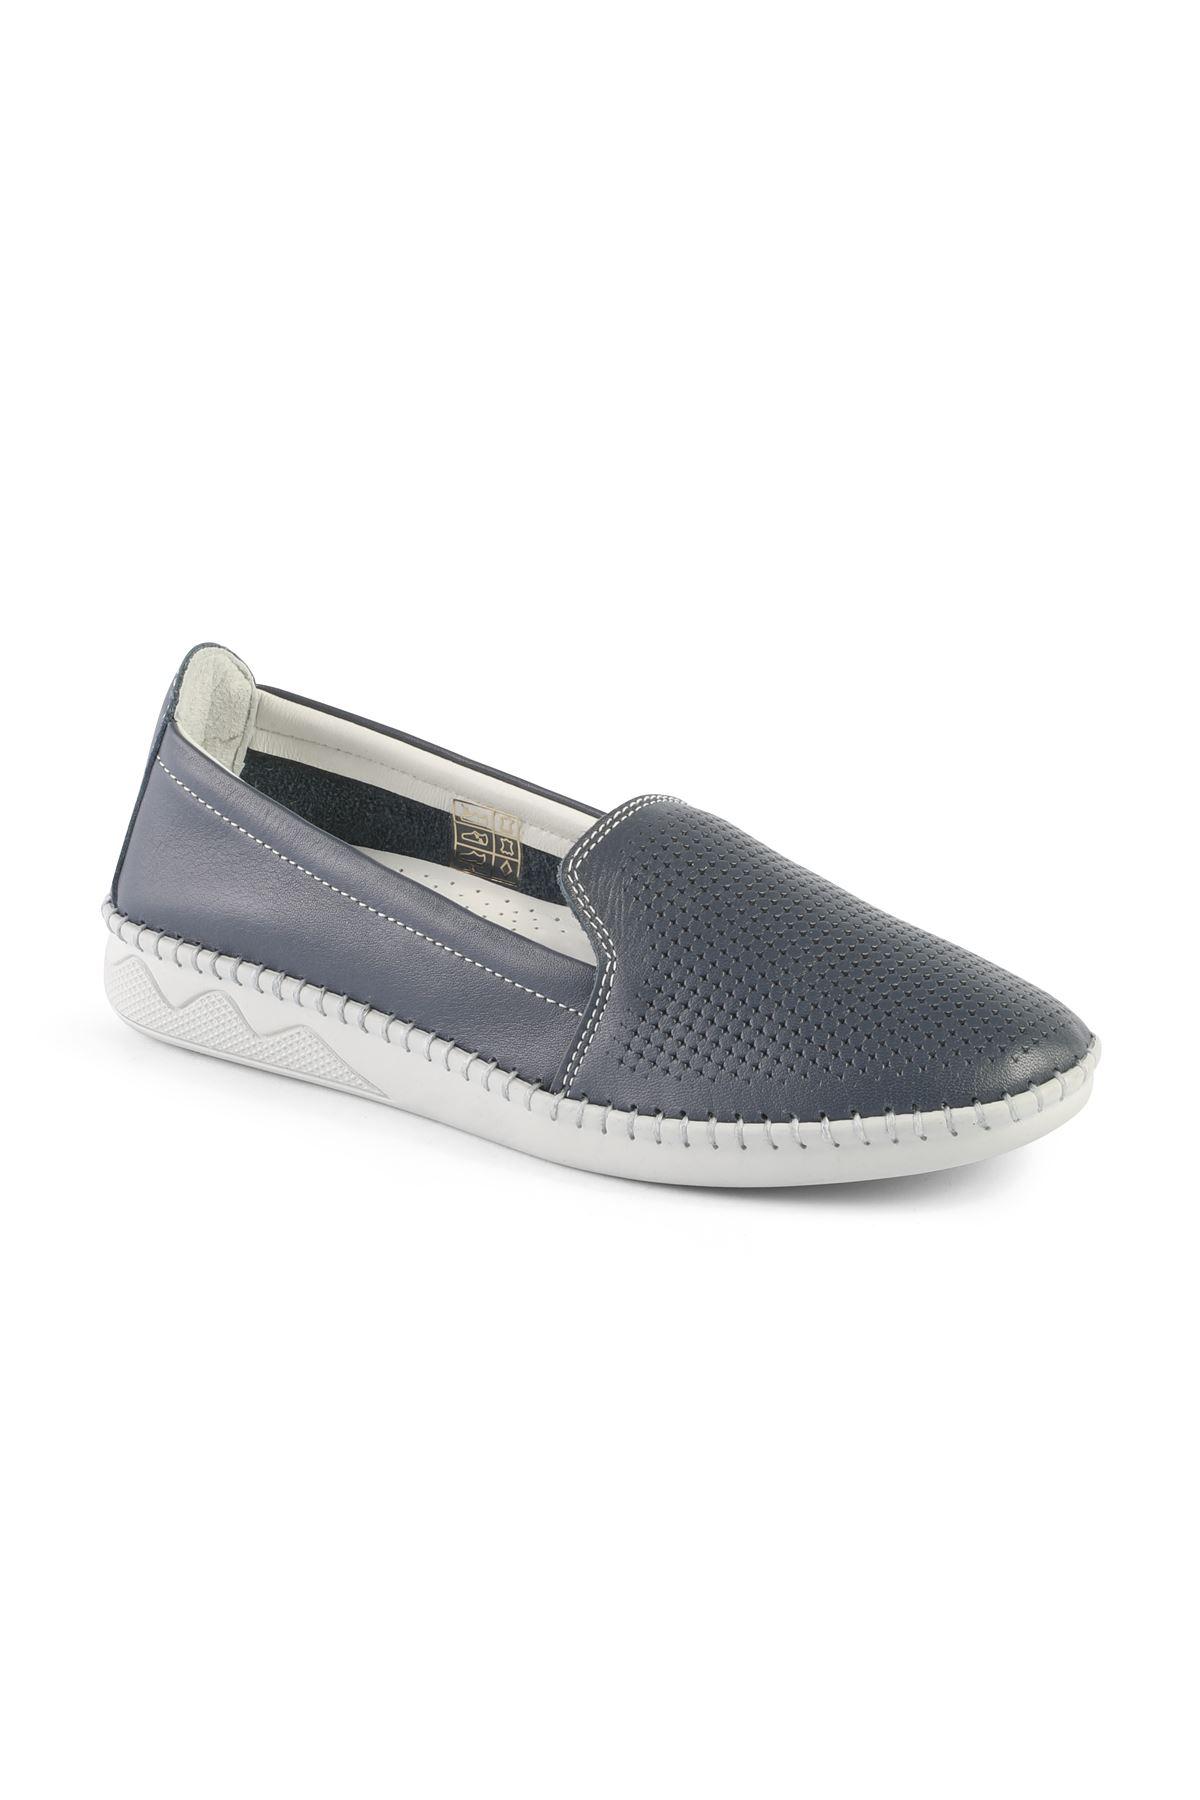 Libero FMS239 Lacivert Babet Ayakkabı